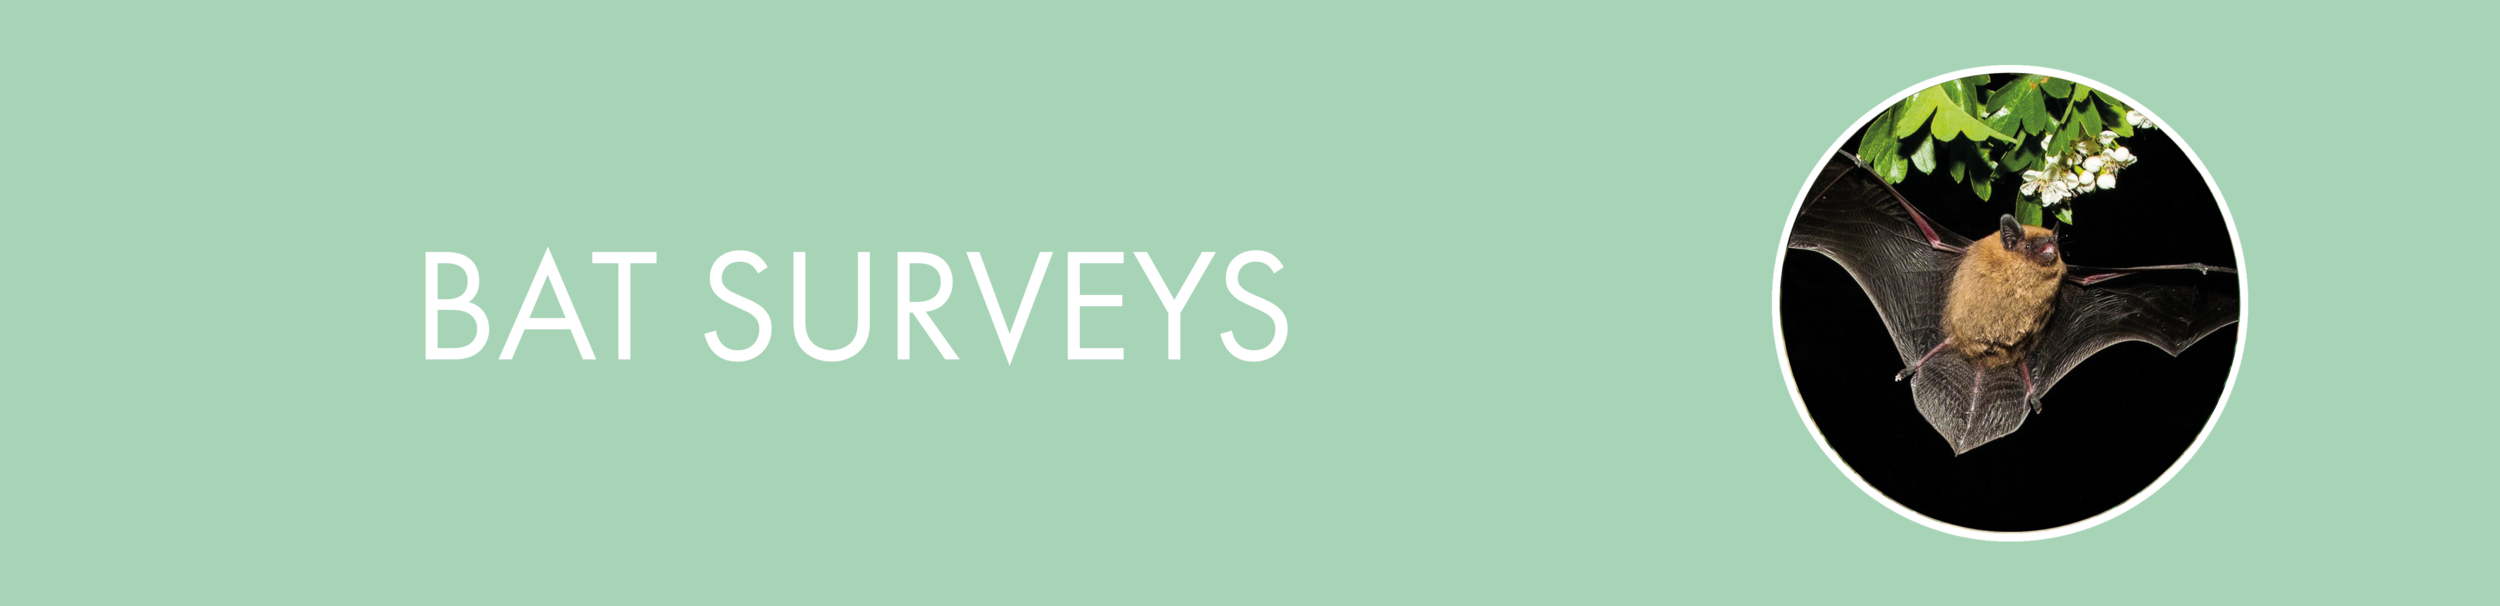 batsurveys.png